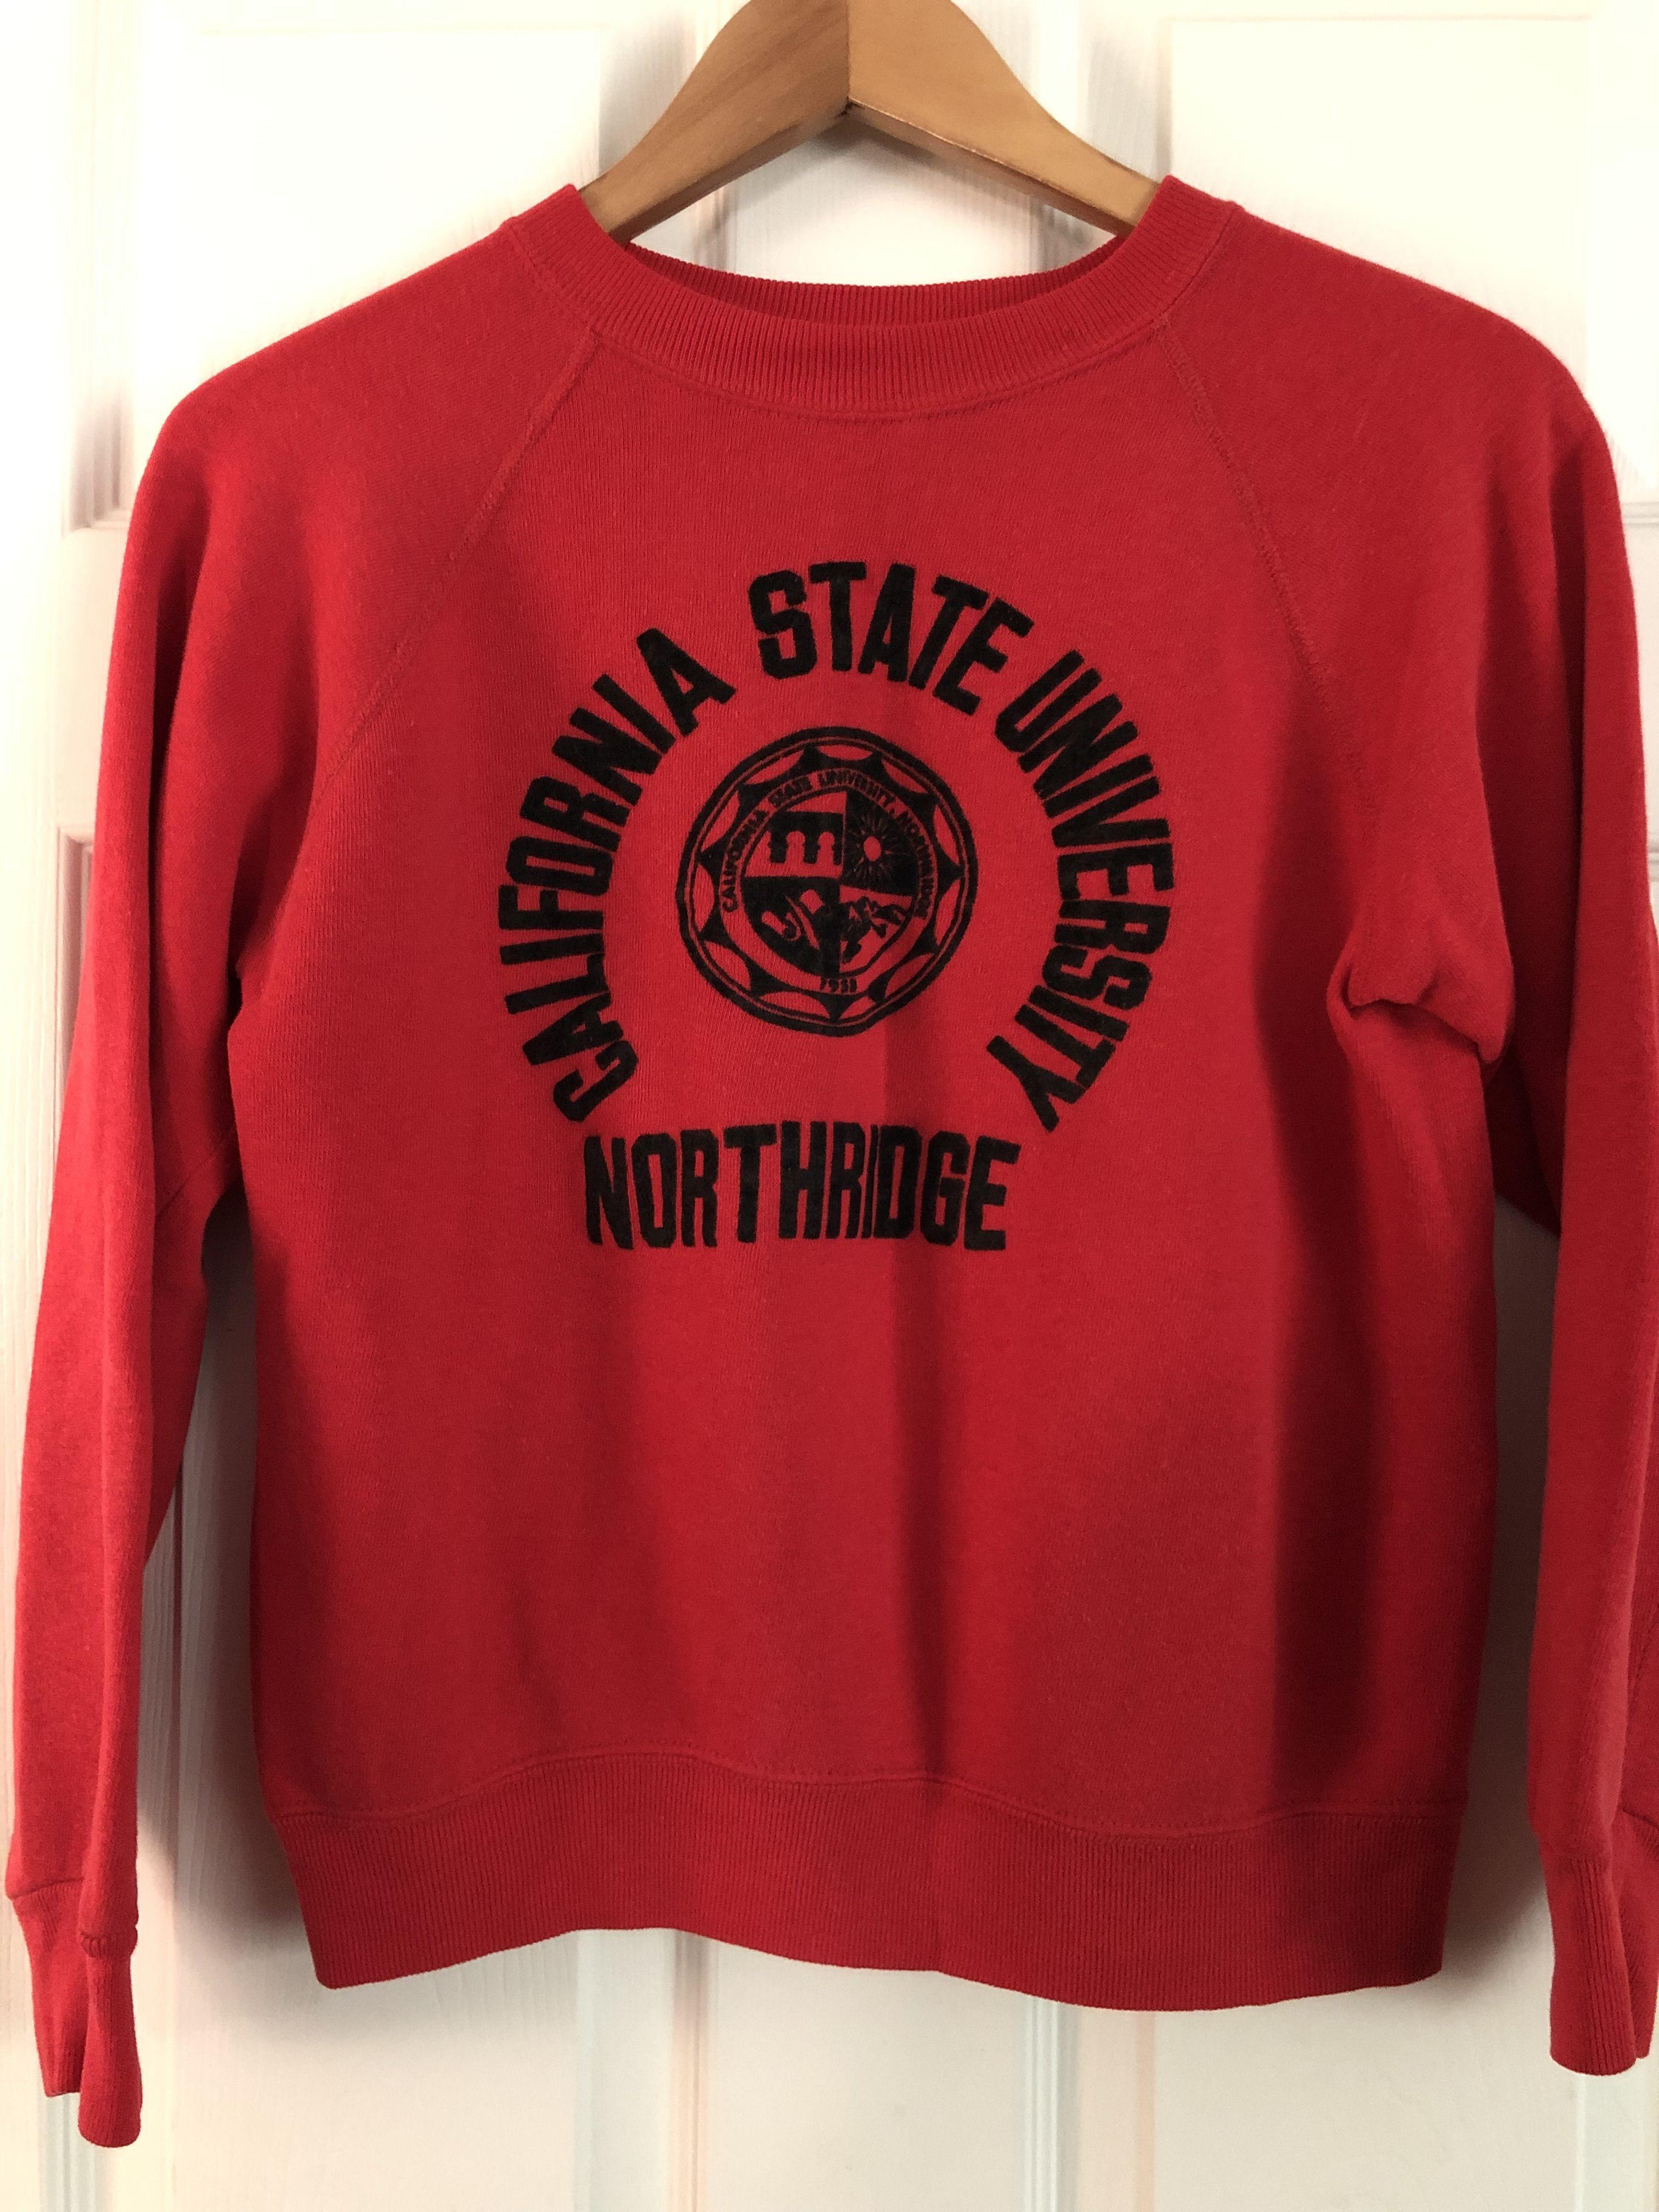 Sold Vintage California State University Northridge Sweatshirt Sweatshirts Vintage Sweatshirt Fleece Lined Hoodie [ 4032 x 3024 Pixel ]